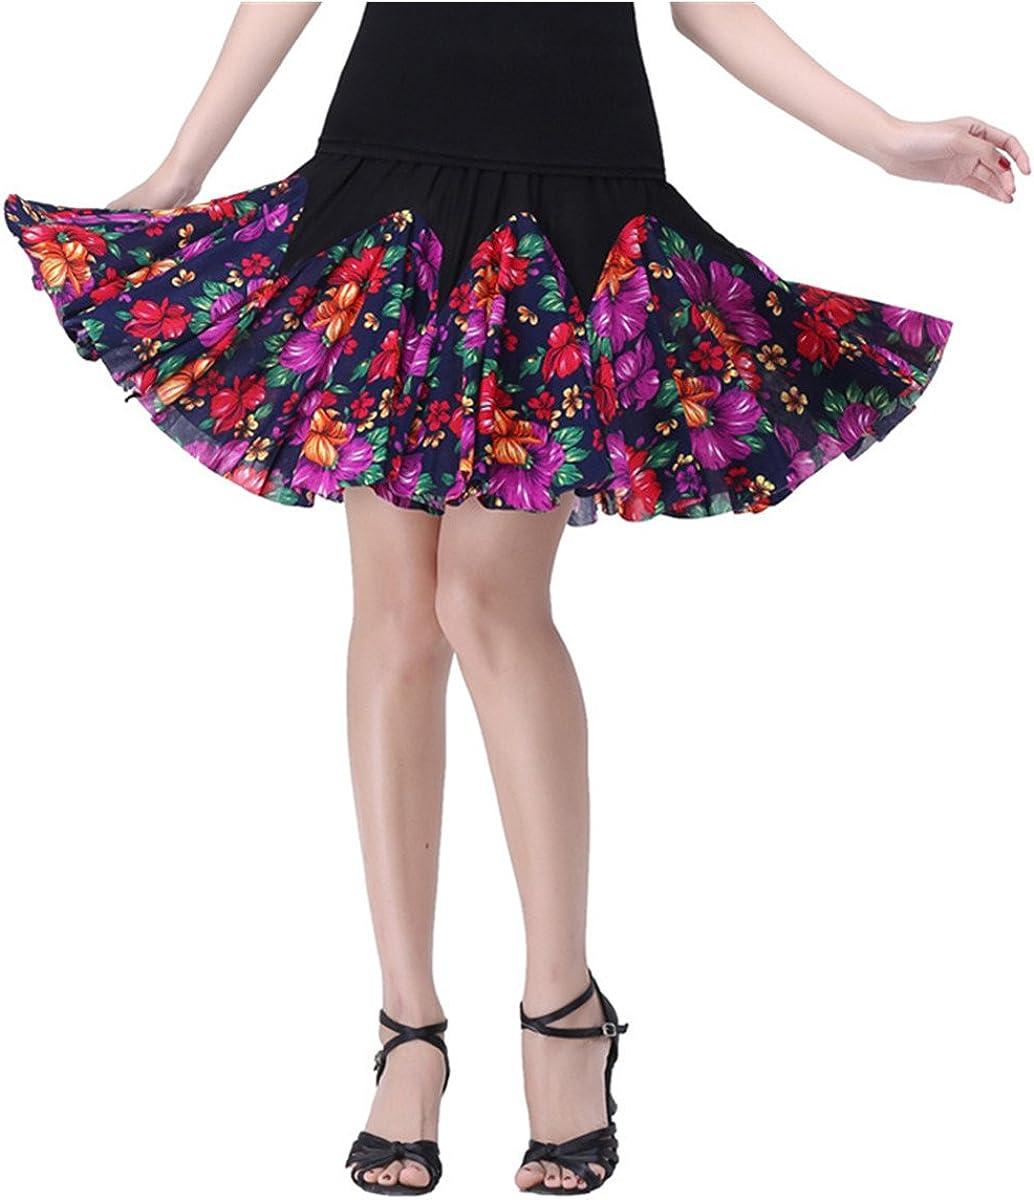 Women Latin Dance Skirt Salsa Tango Rumba Cha Cha Dancing Costume Dress w//Shorts